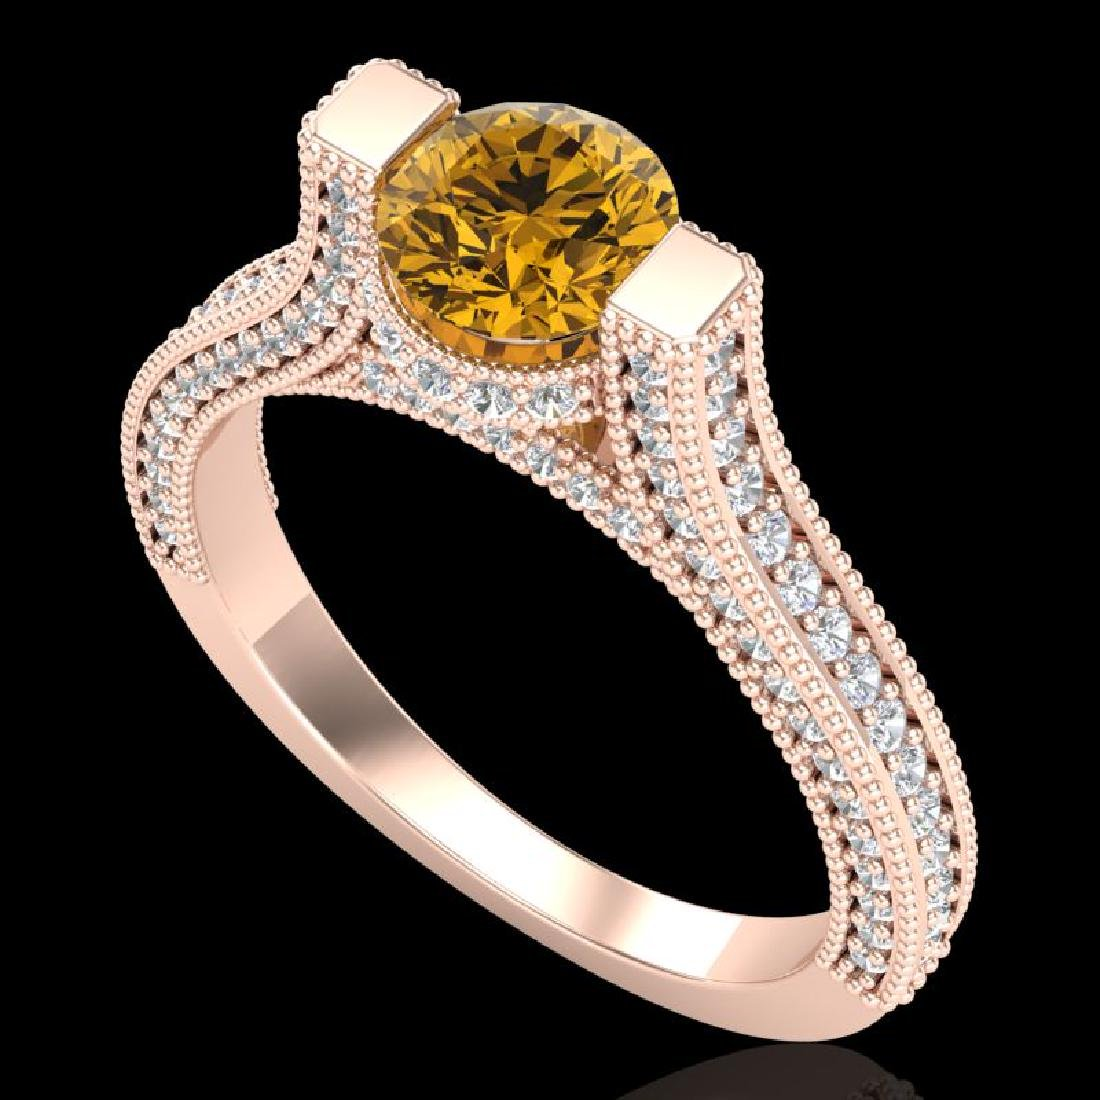 2 CTW Intense Fancy Yellow Diamond Engagement Micro